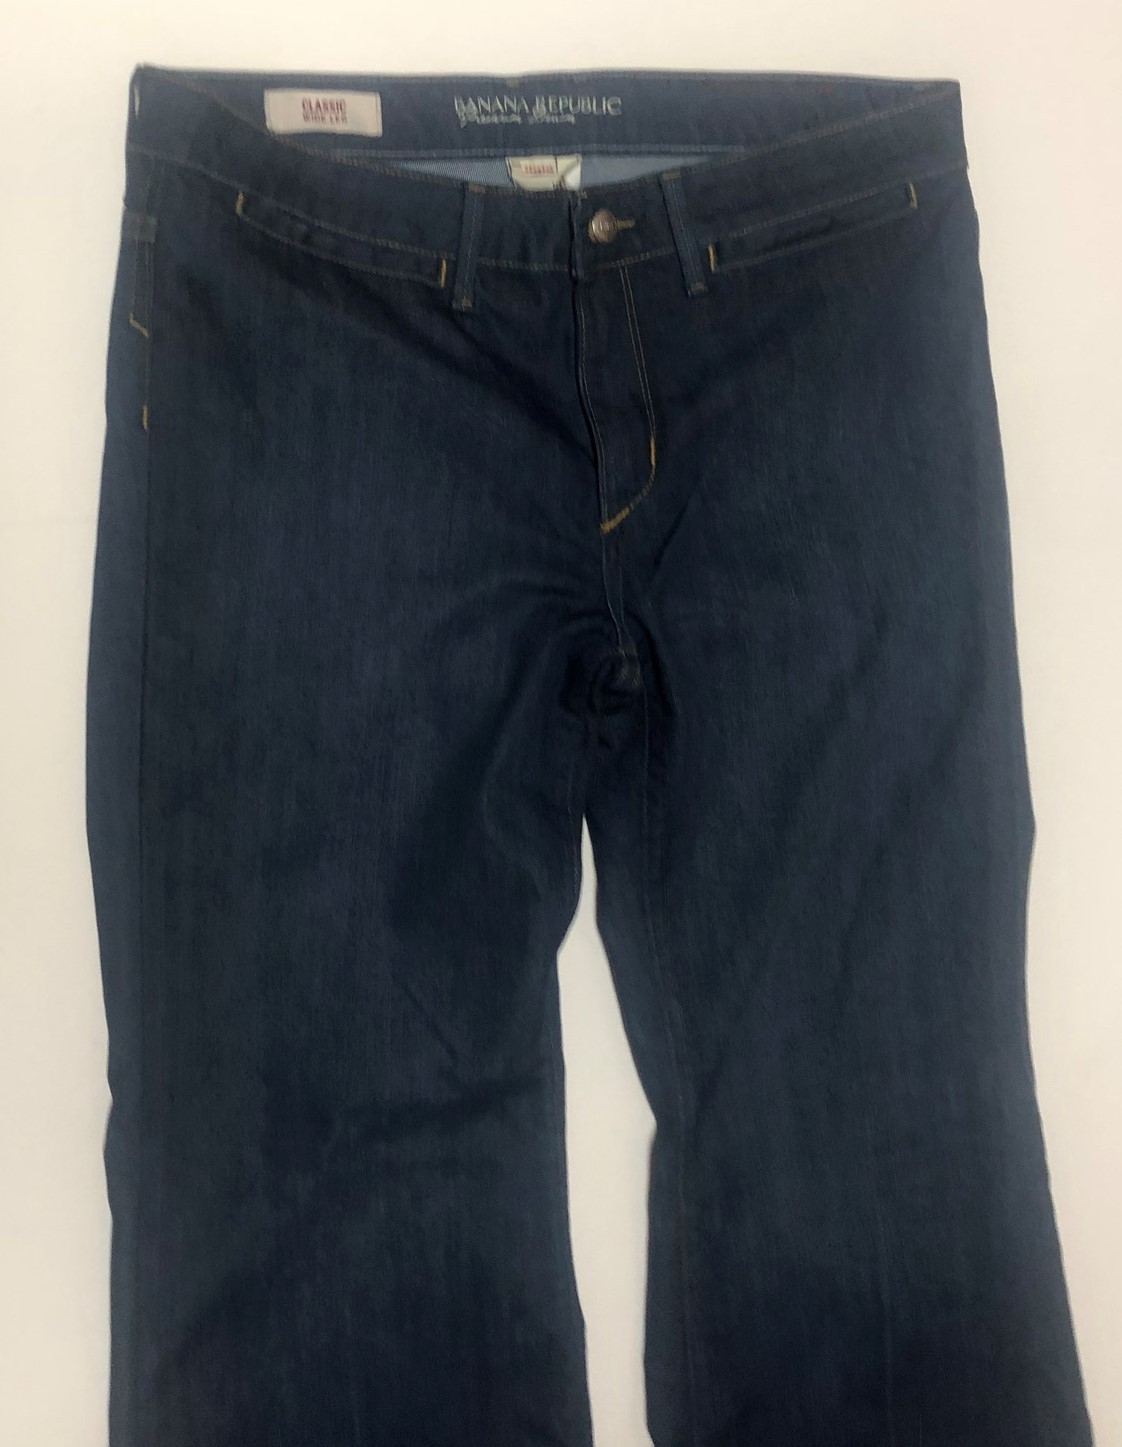 Banana Republic Classic Jeans Sz 10P Stretch Medium Blue Wide Leg image 3